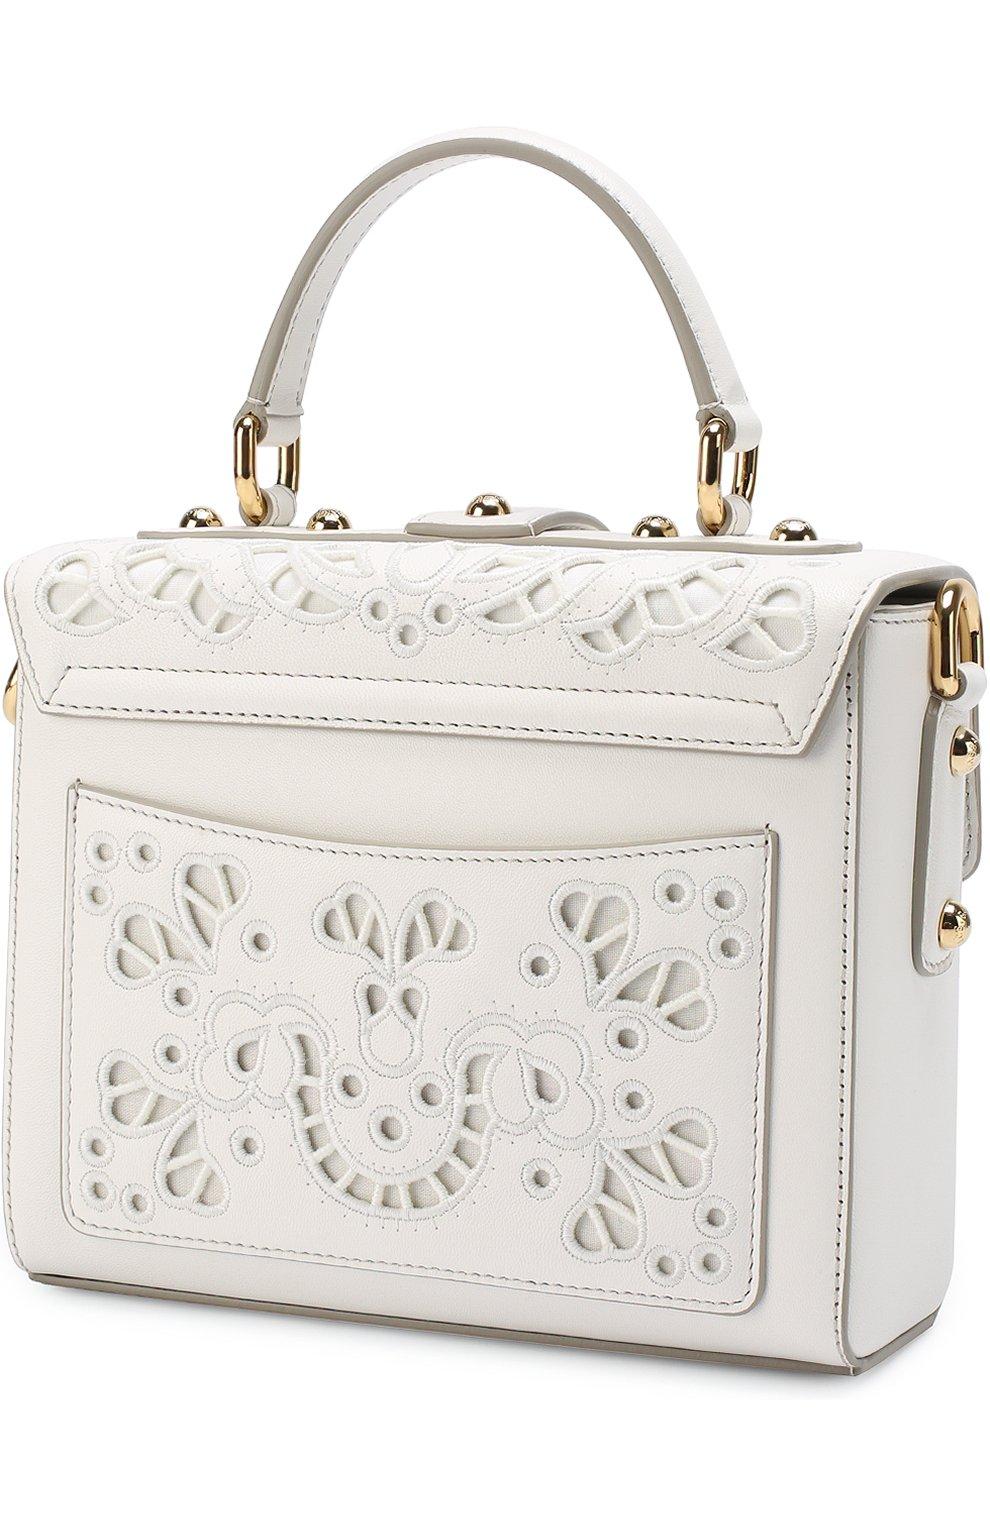 Сумка Dolce Soft с перфорацией Dolce & Gabbana белая цвета | Фото №3